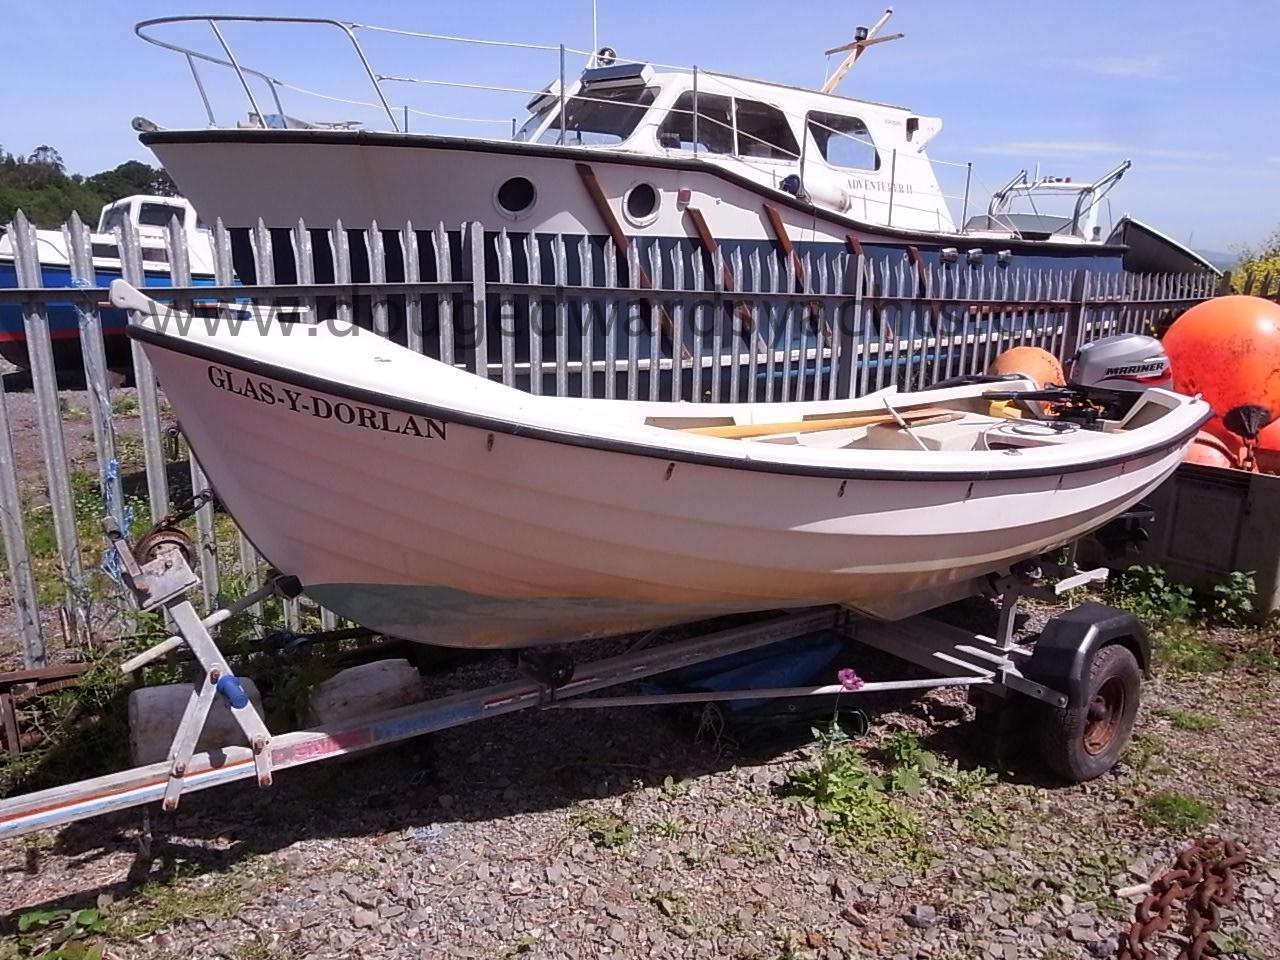 Arran 14 Bilge Keel Day Fishing Boat Image